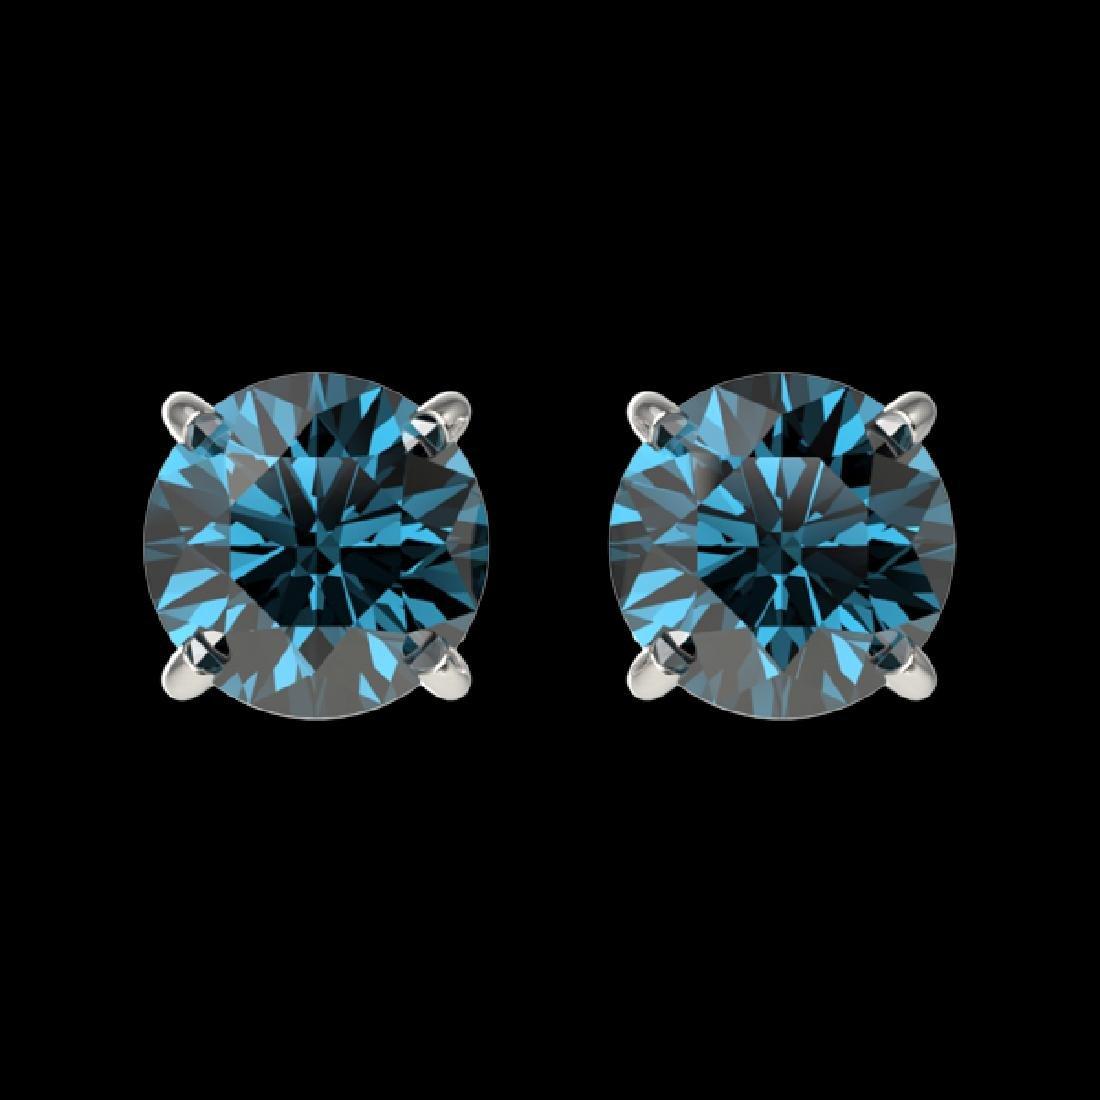 1 CTW Certified Intense Blue SI Diamond Solitaire Stud